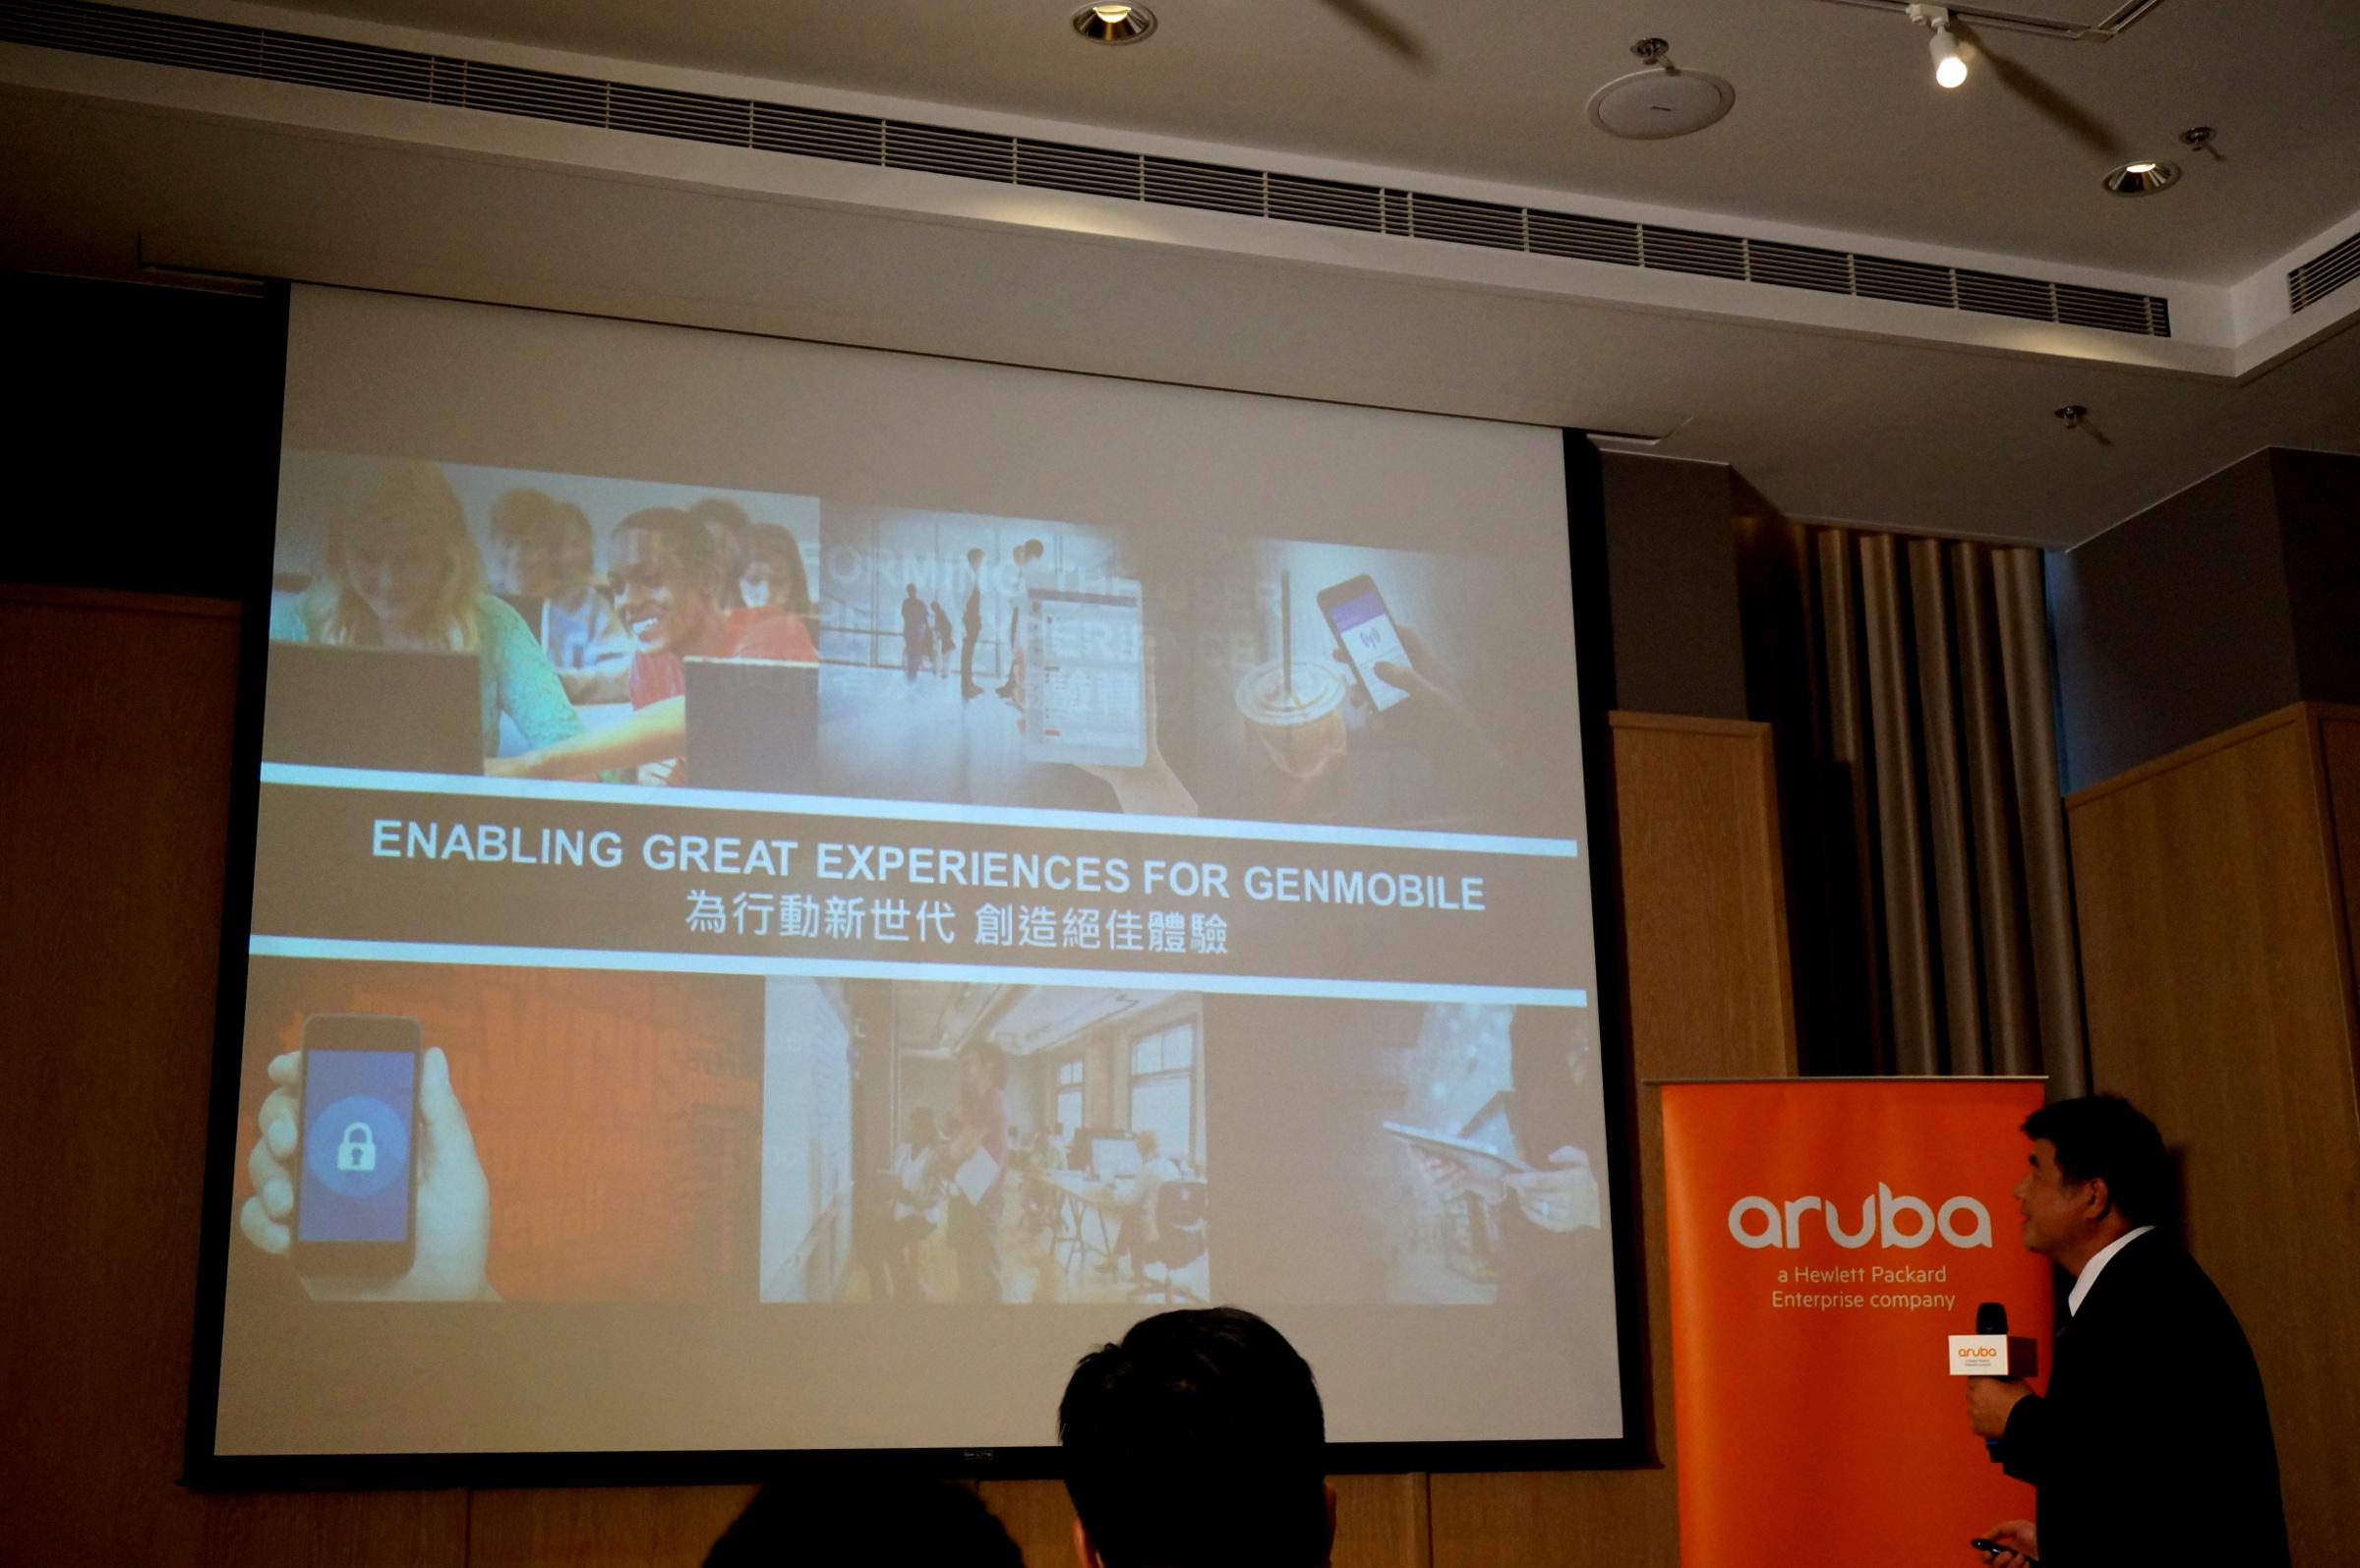 HPE-Aruba-mobile-experience2017